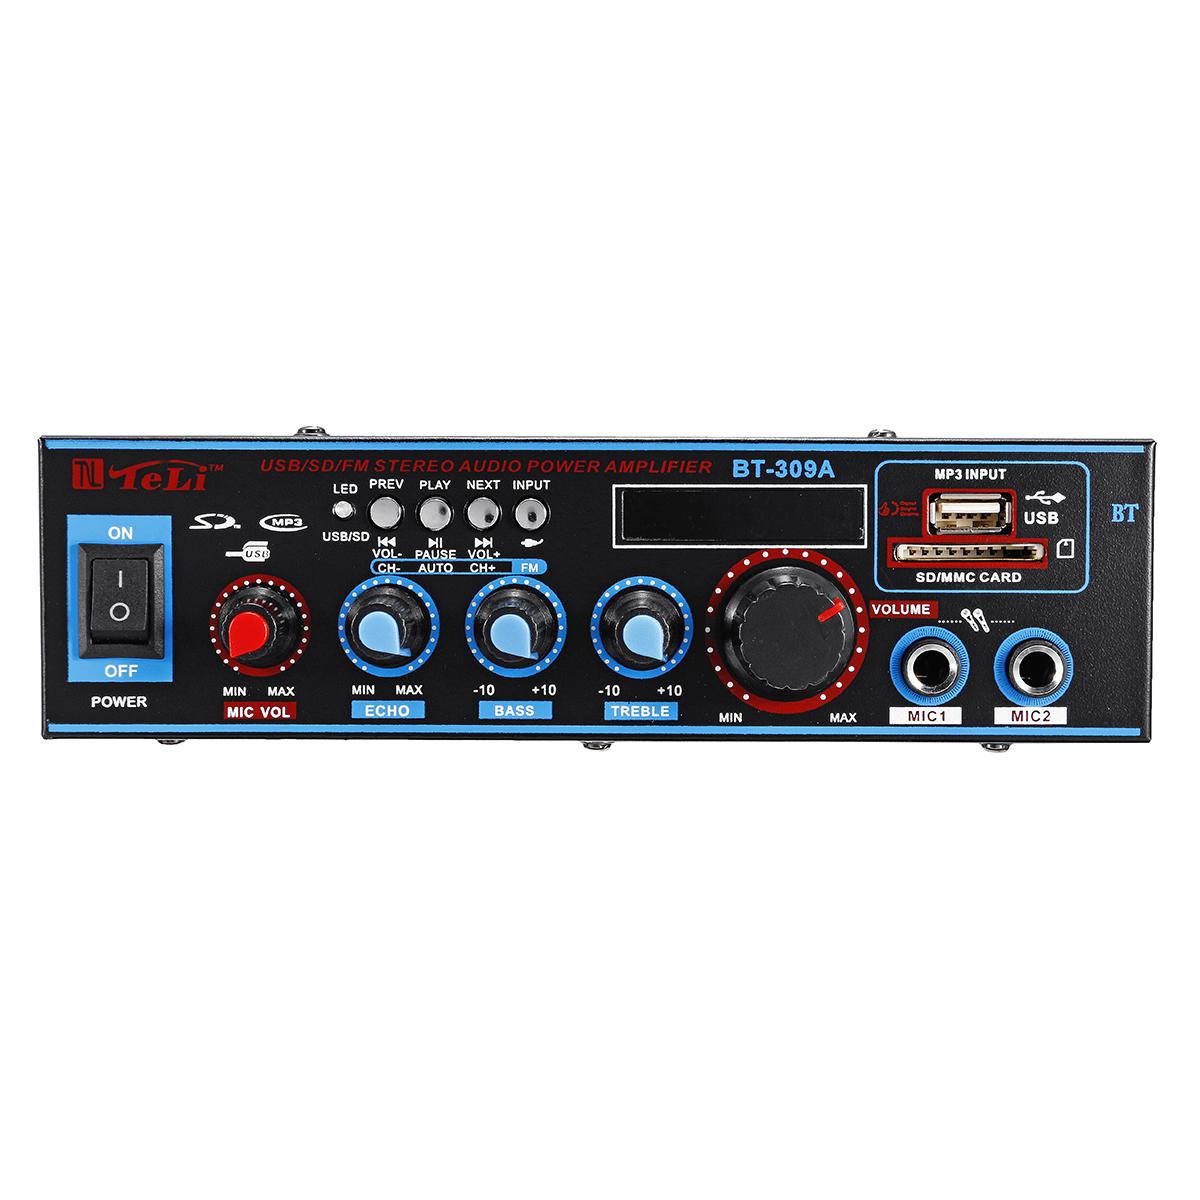 12V/220V HIFI Audio Stereo Power Amplifier Bluetooth FM Radio Car Home Karaoke